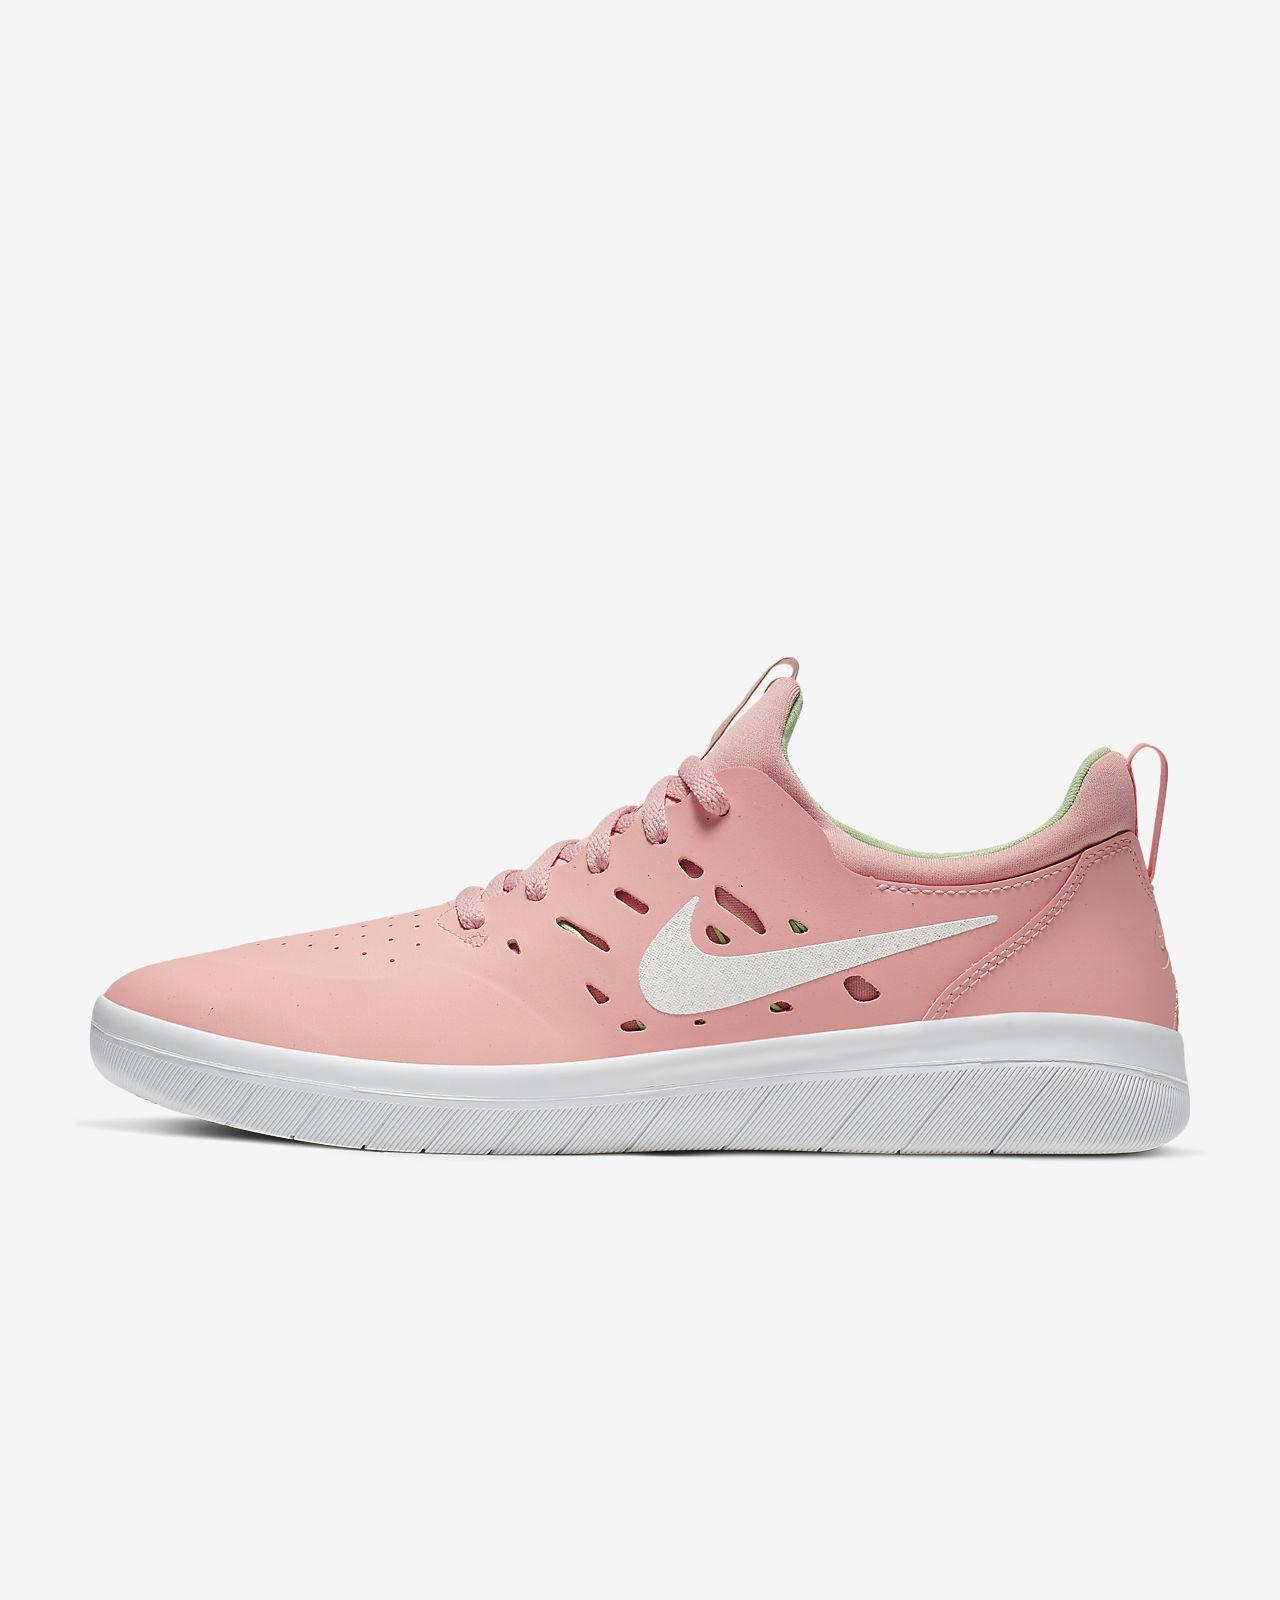 Nike SB Nyjah Free Skateboardschuh